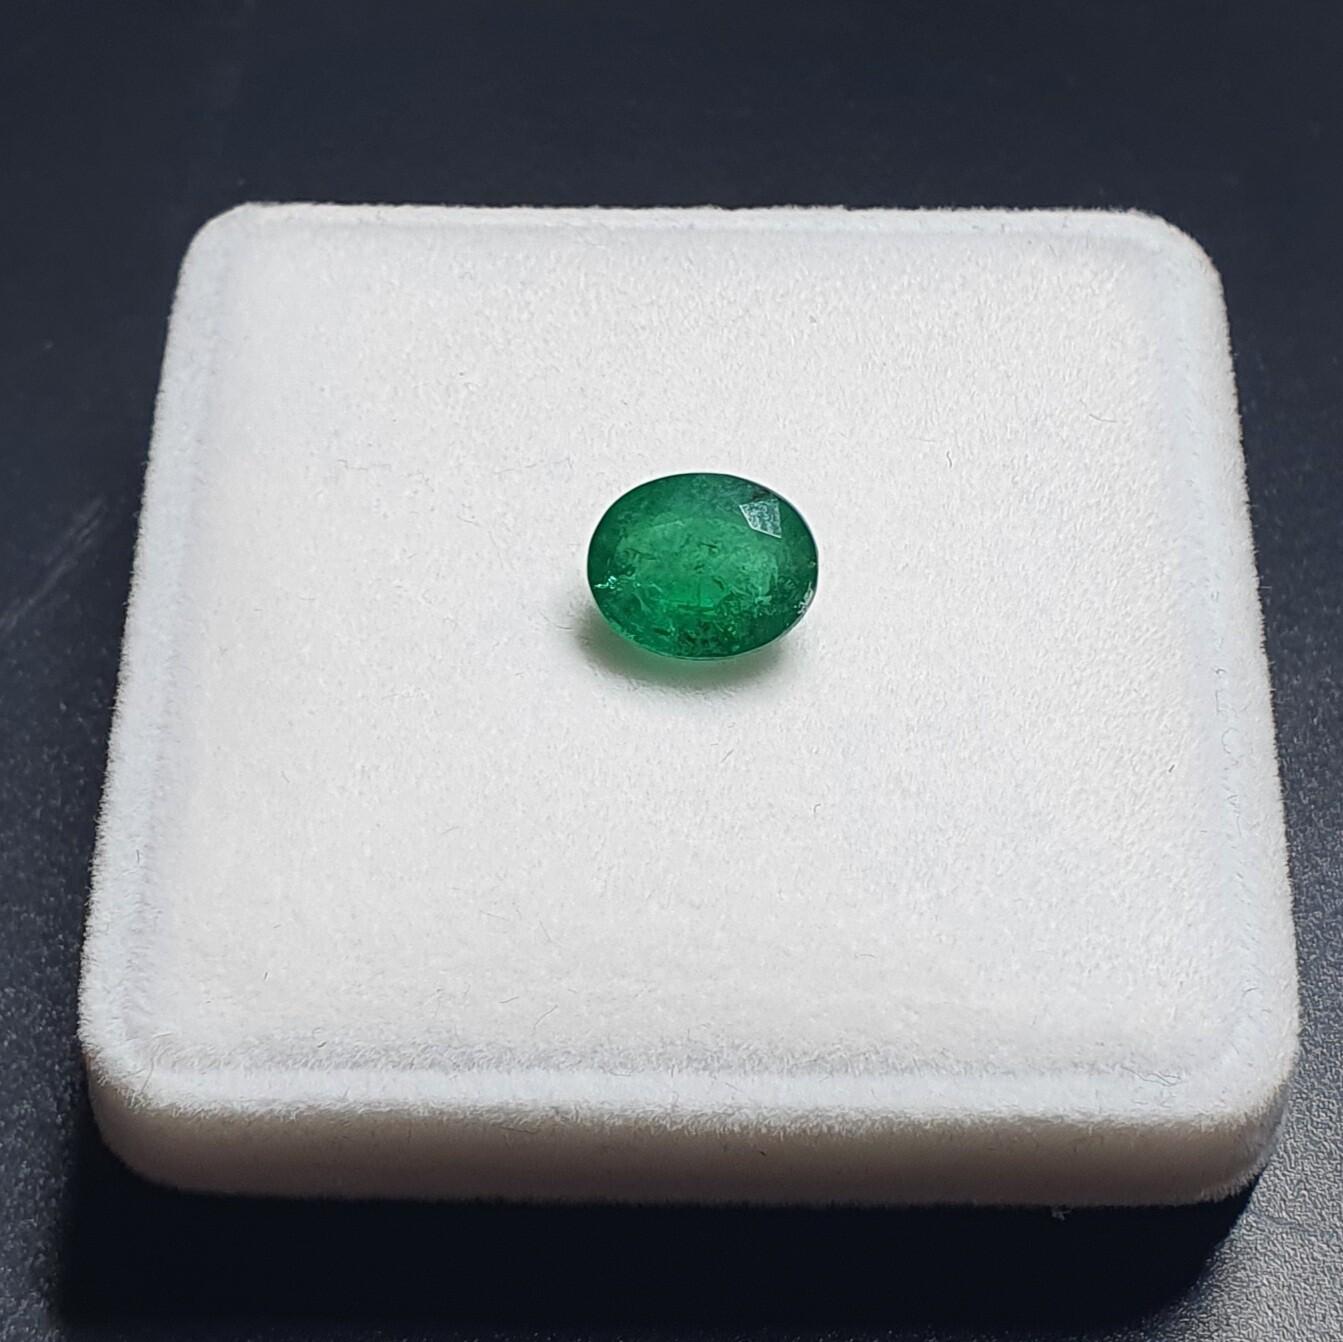 Emerald Oval cut 3.08 ct